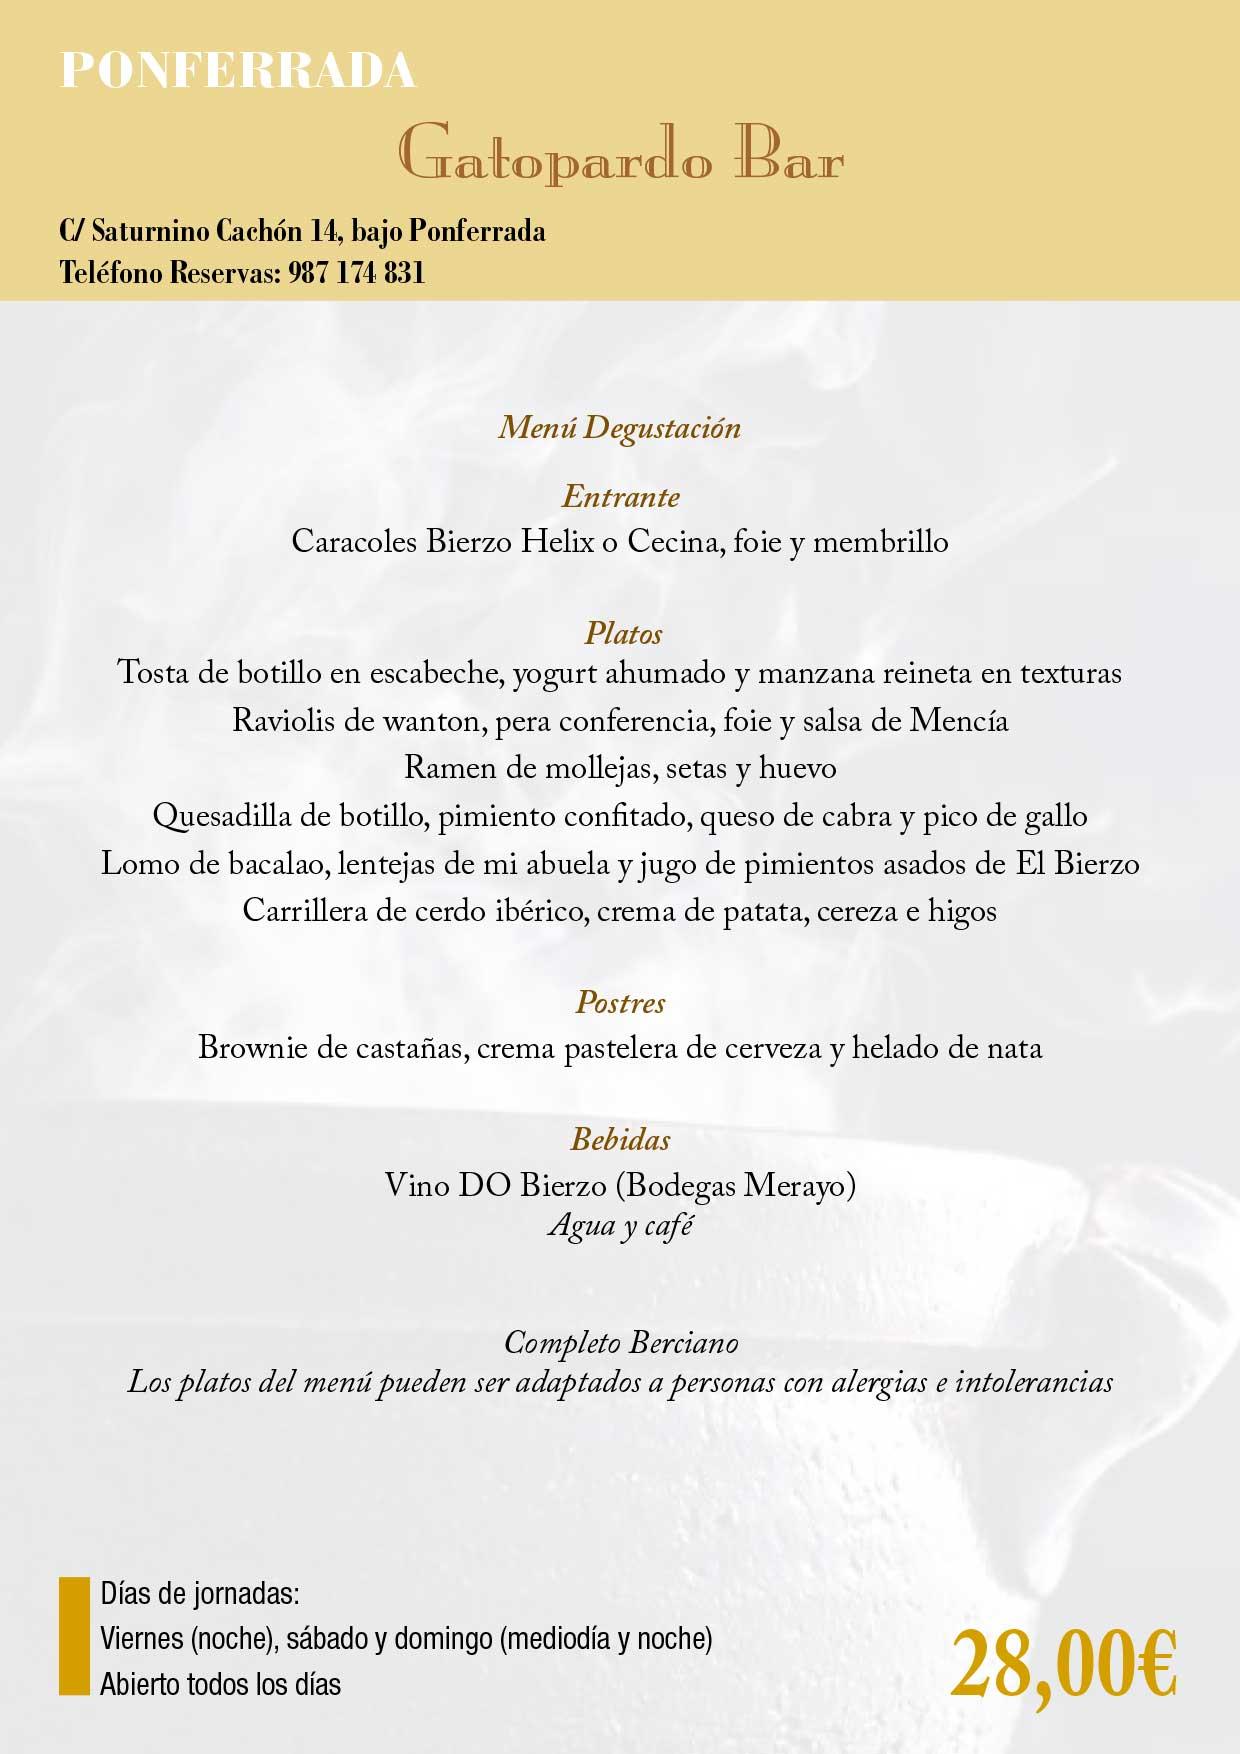 XXXIII Jornadas gastronómicas del Bierzo 2017. Restaurantes participantes 29